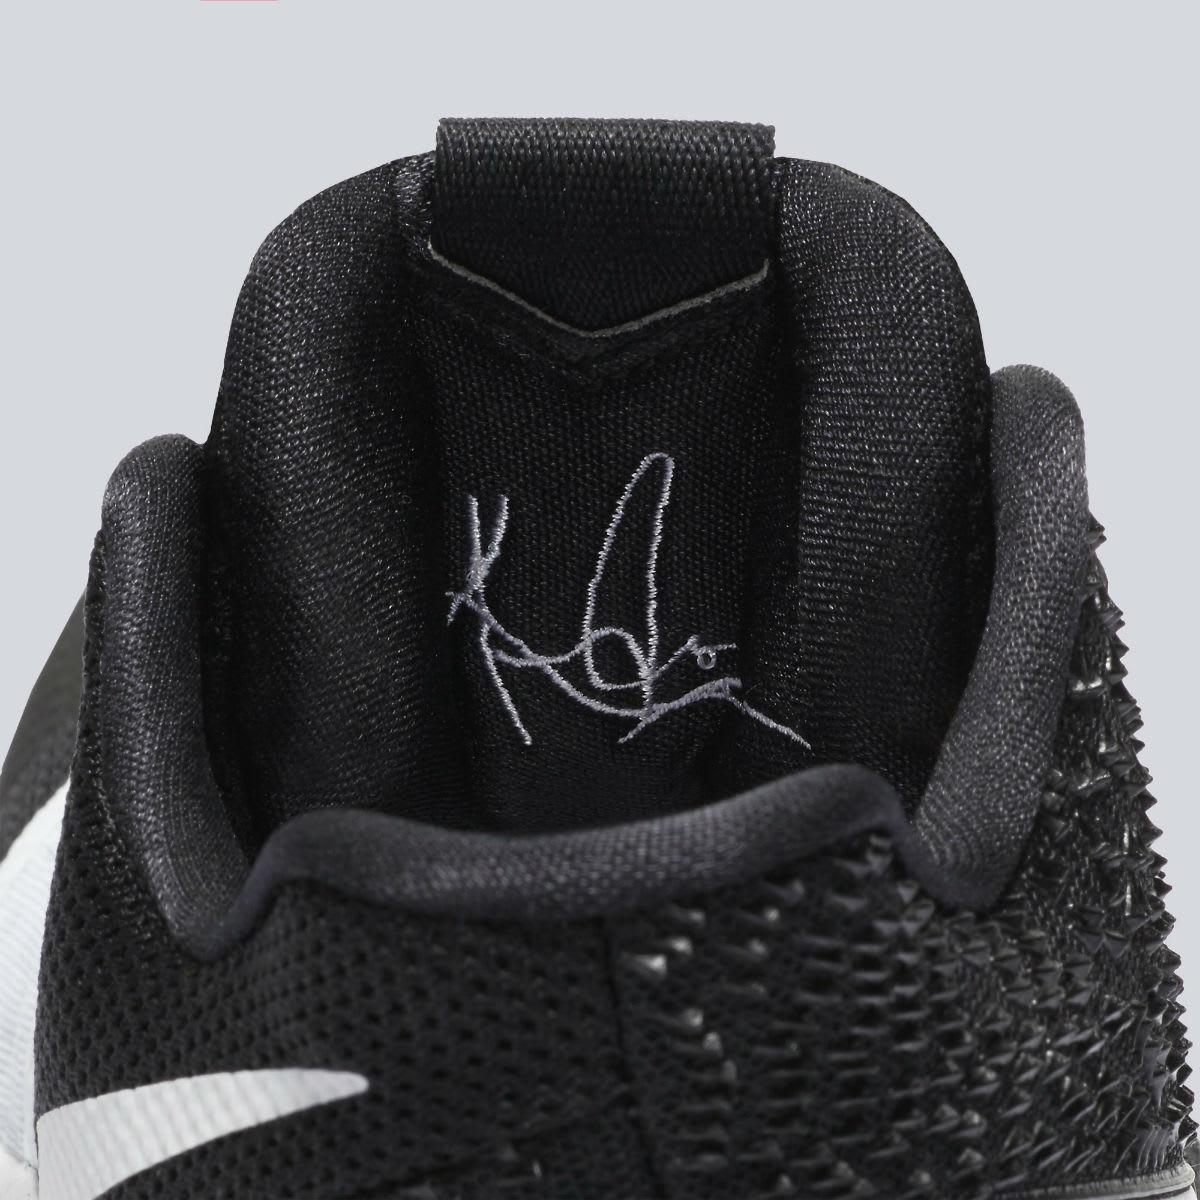 Nike Kyrie 3 Black White Tuxedo Release Date Tongue 917724-001